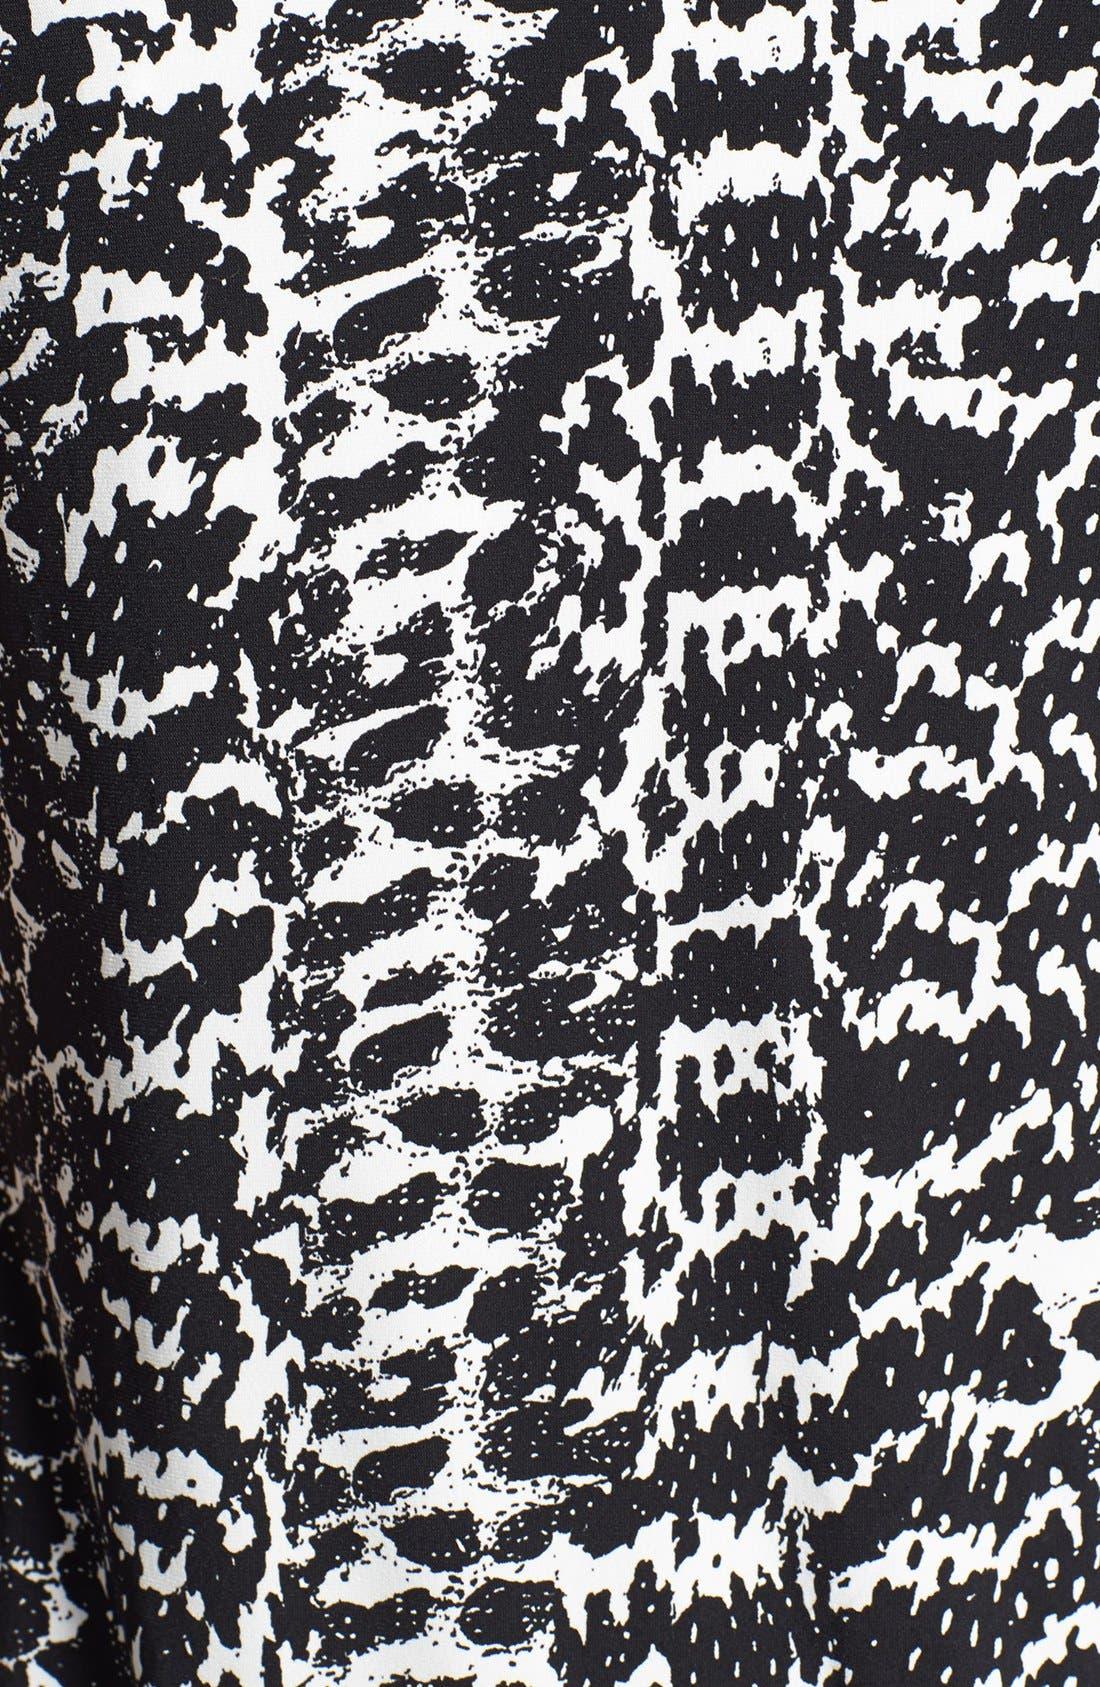 Alternate Image 3  - Vince Camuto 'Animal Tracks' Sleeveless Sheath Dress (Plus Size)